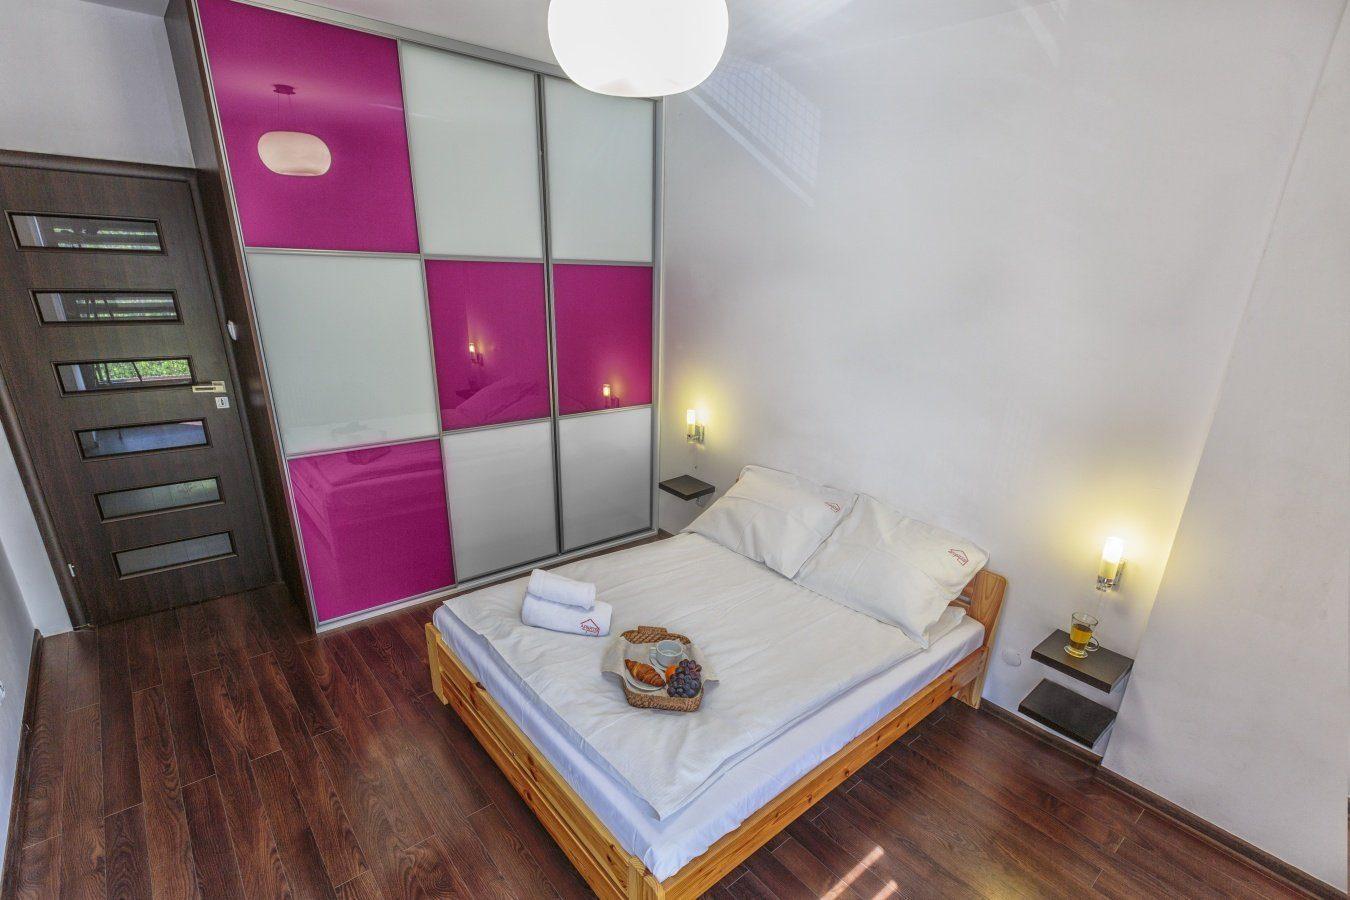 Bedroom at Zeligowskiego Apartments